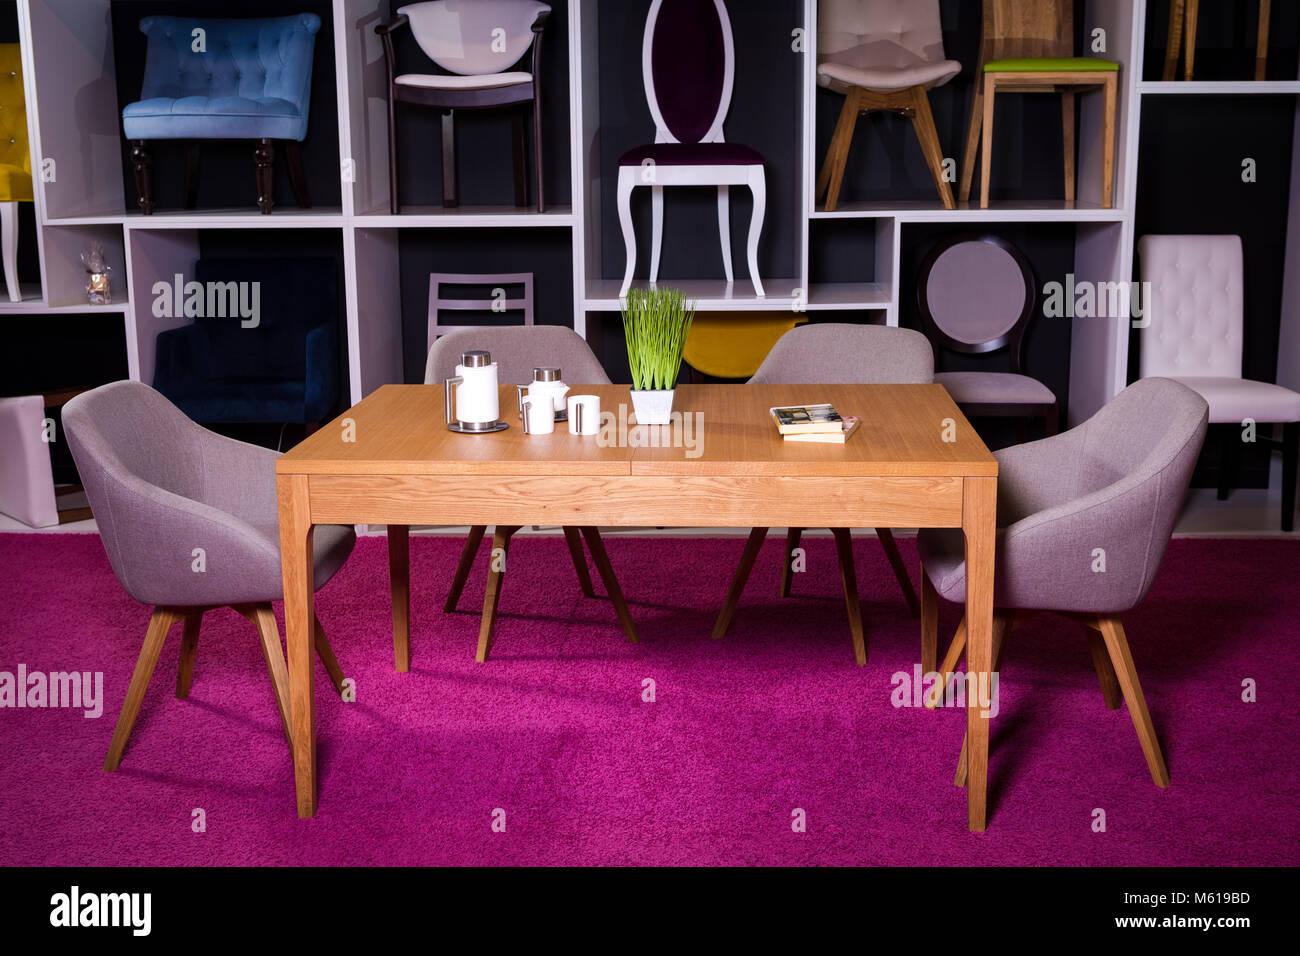 Wooden Panels Carpet Stockfotos & Wooden Panels Carpet Bilder - Alamy